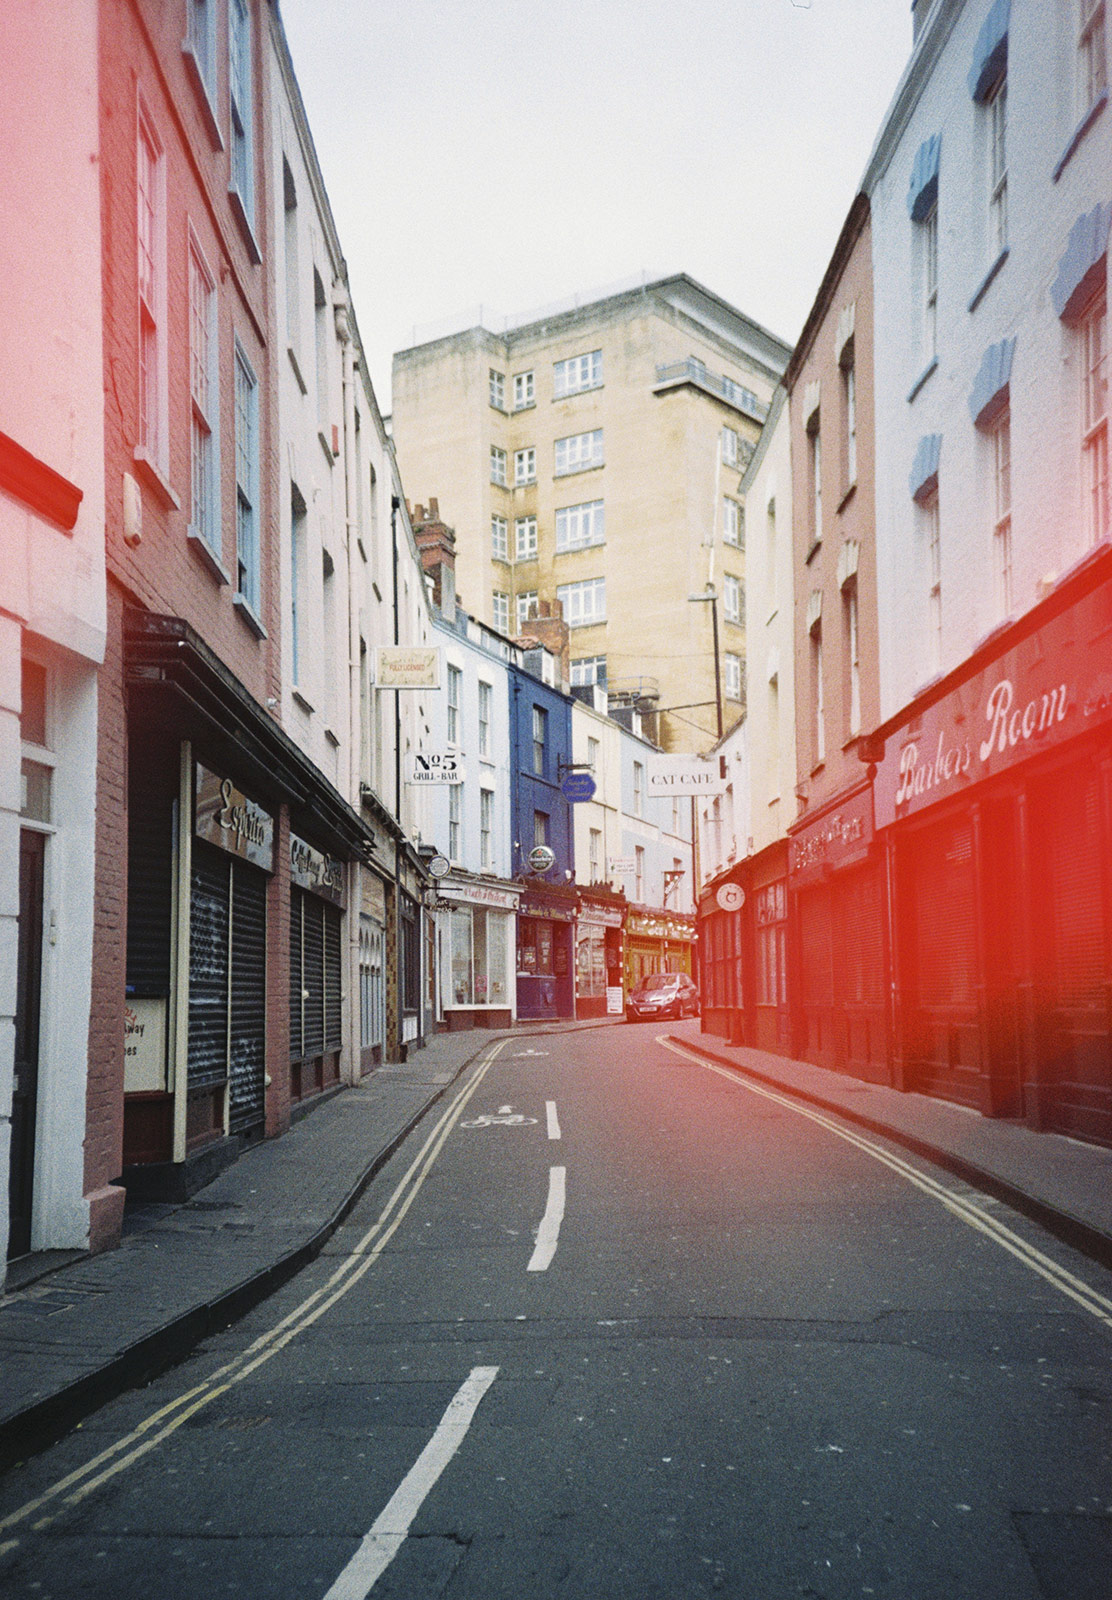 Colourful buildings along street